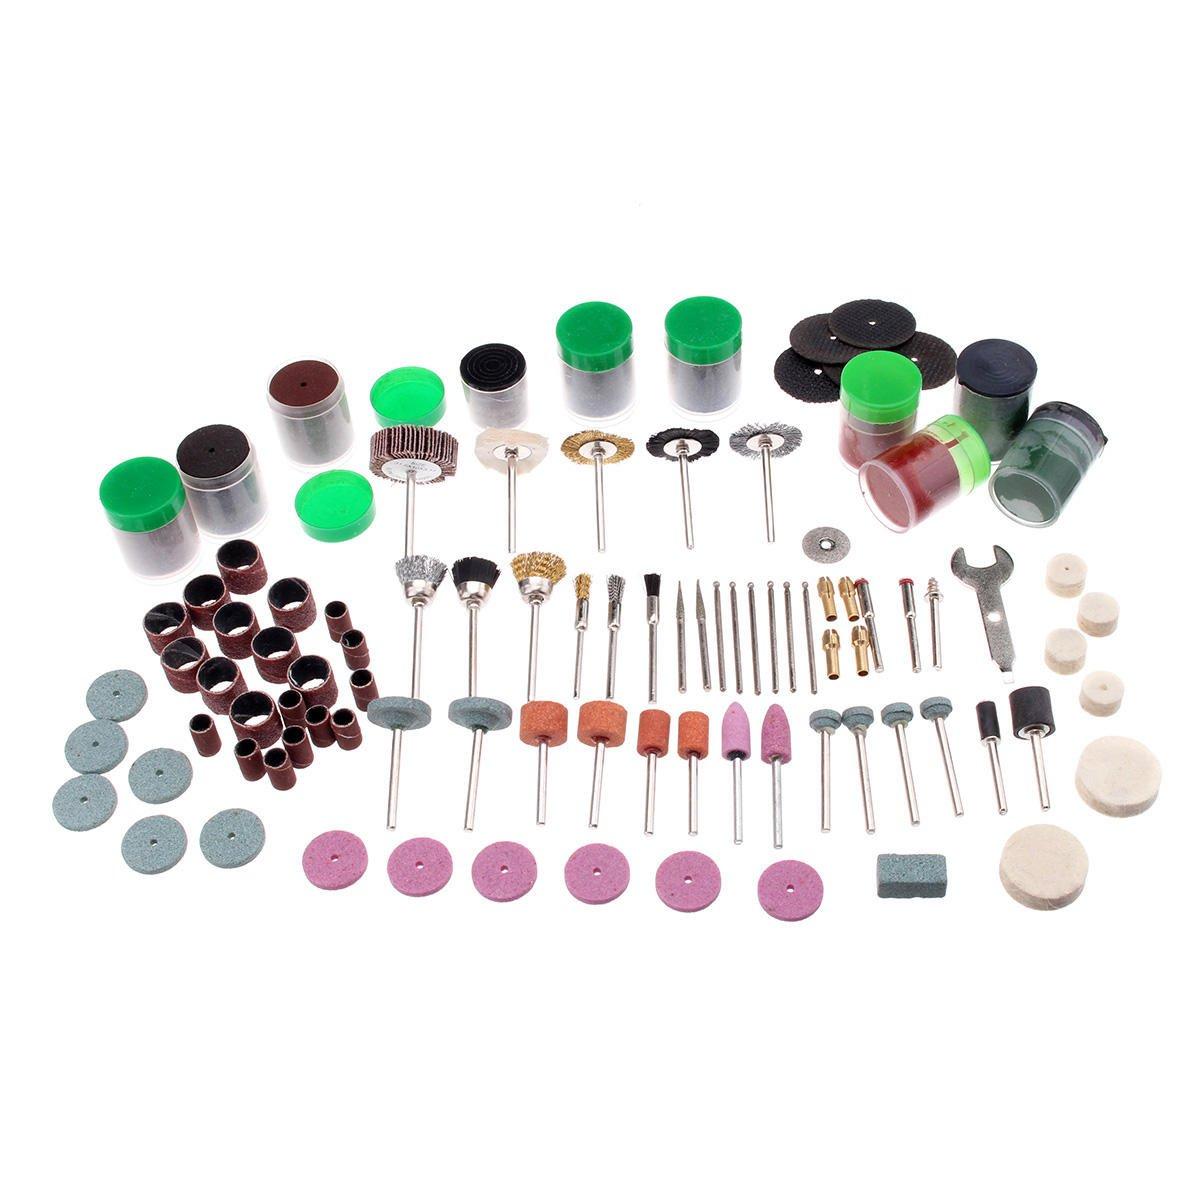 262pcs Multi Rotary Power Drill Kit Polishing Sanding Grinding Tool Accessories Abrasive Tool